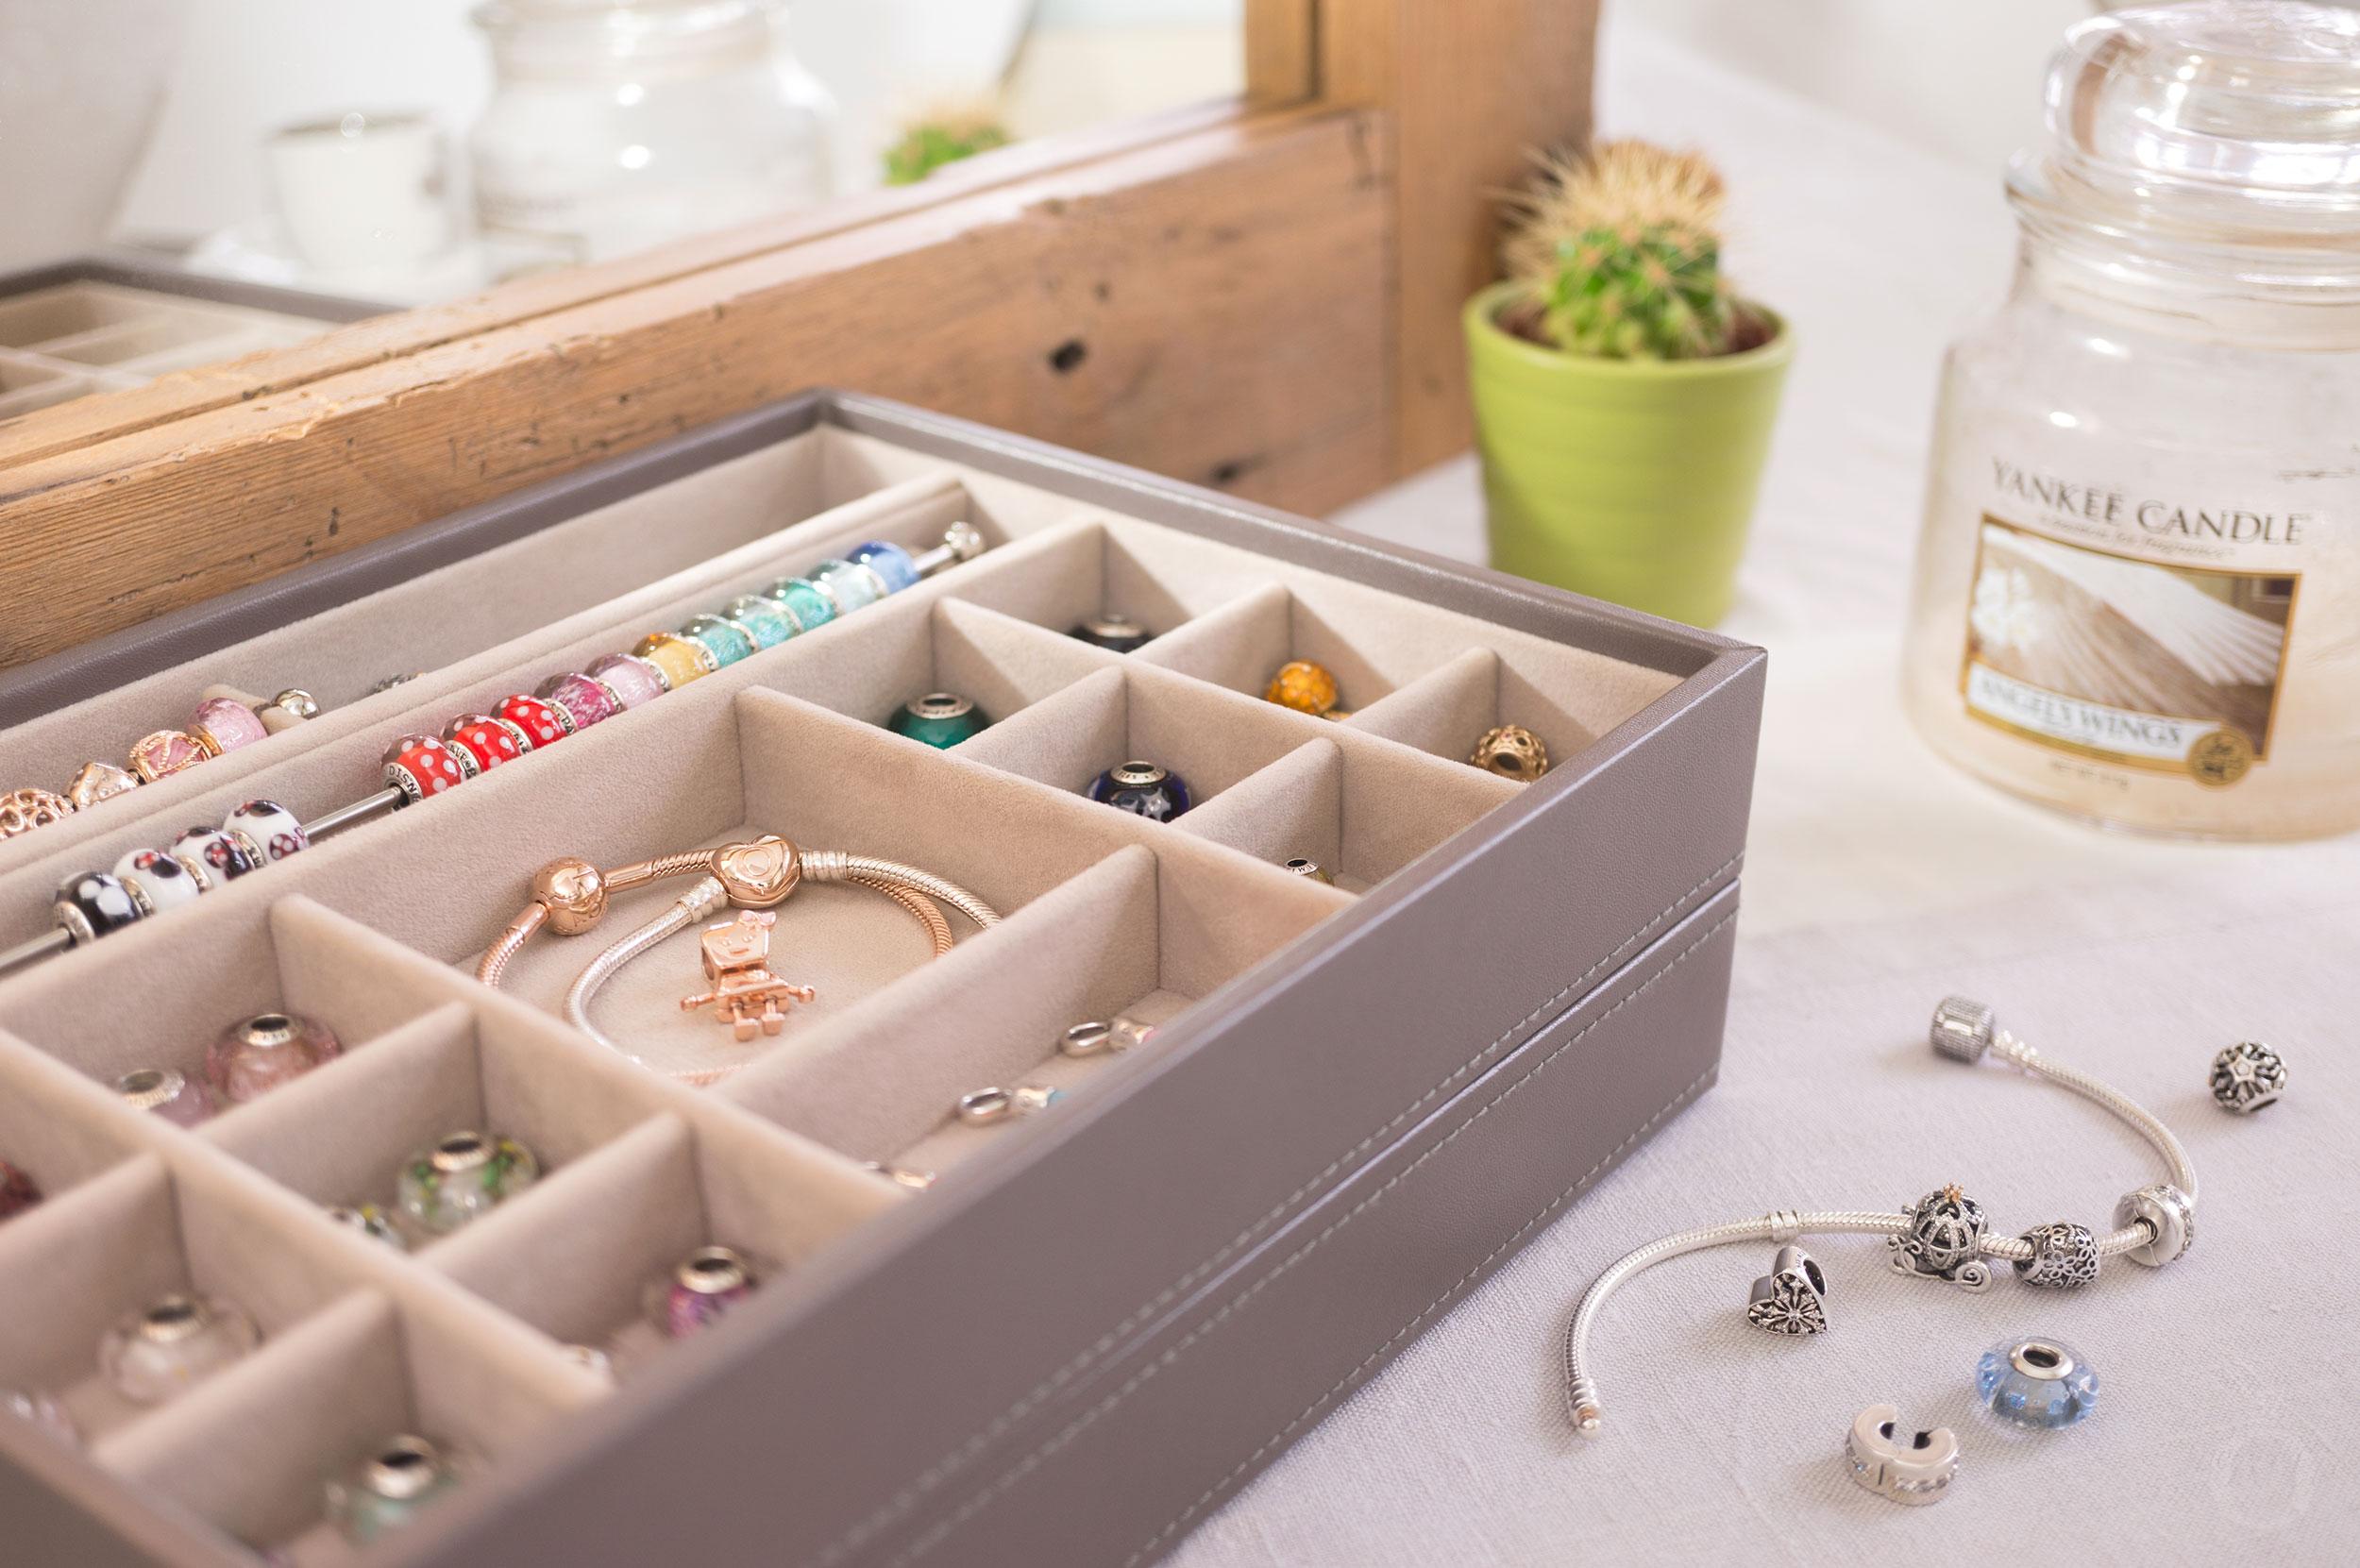 Parity Medium Pandora Jewellery Stacking Box Up To 70 Off